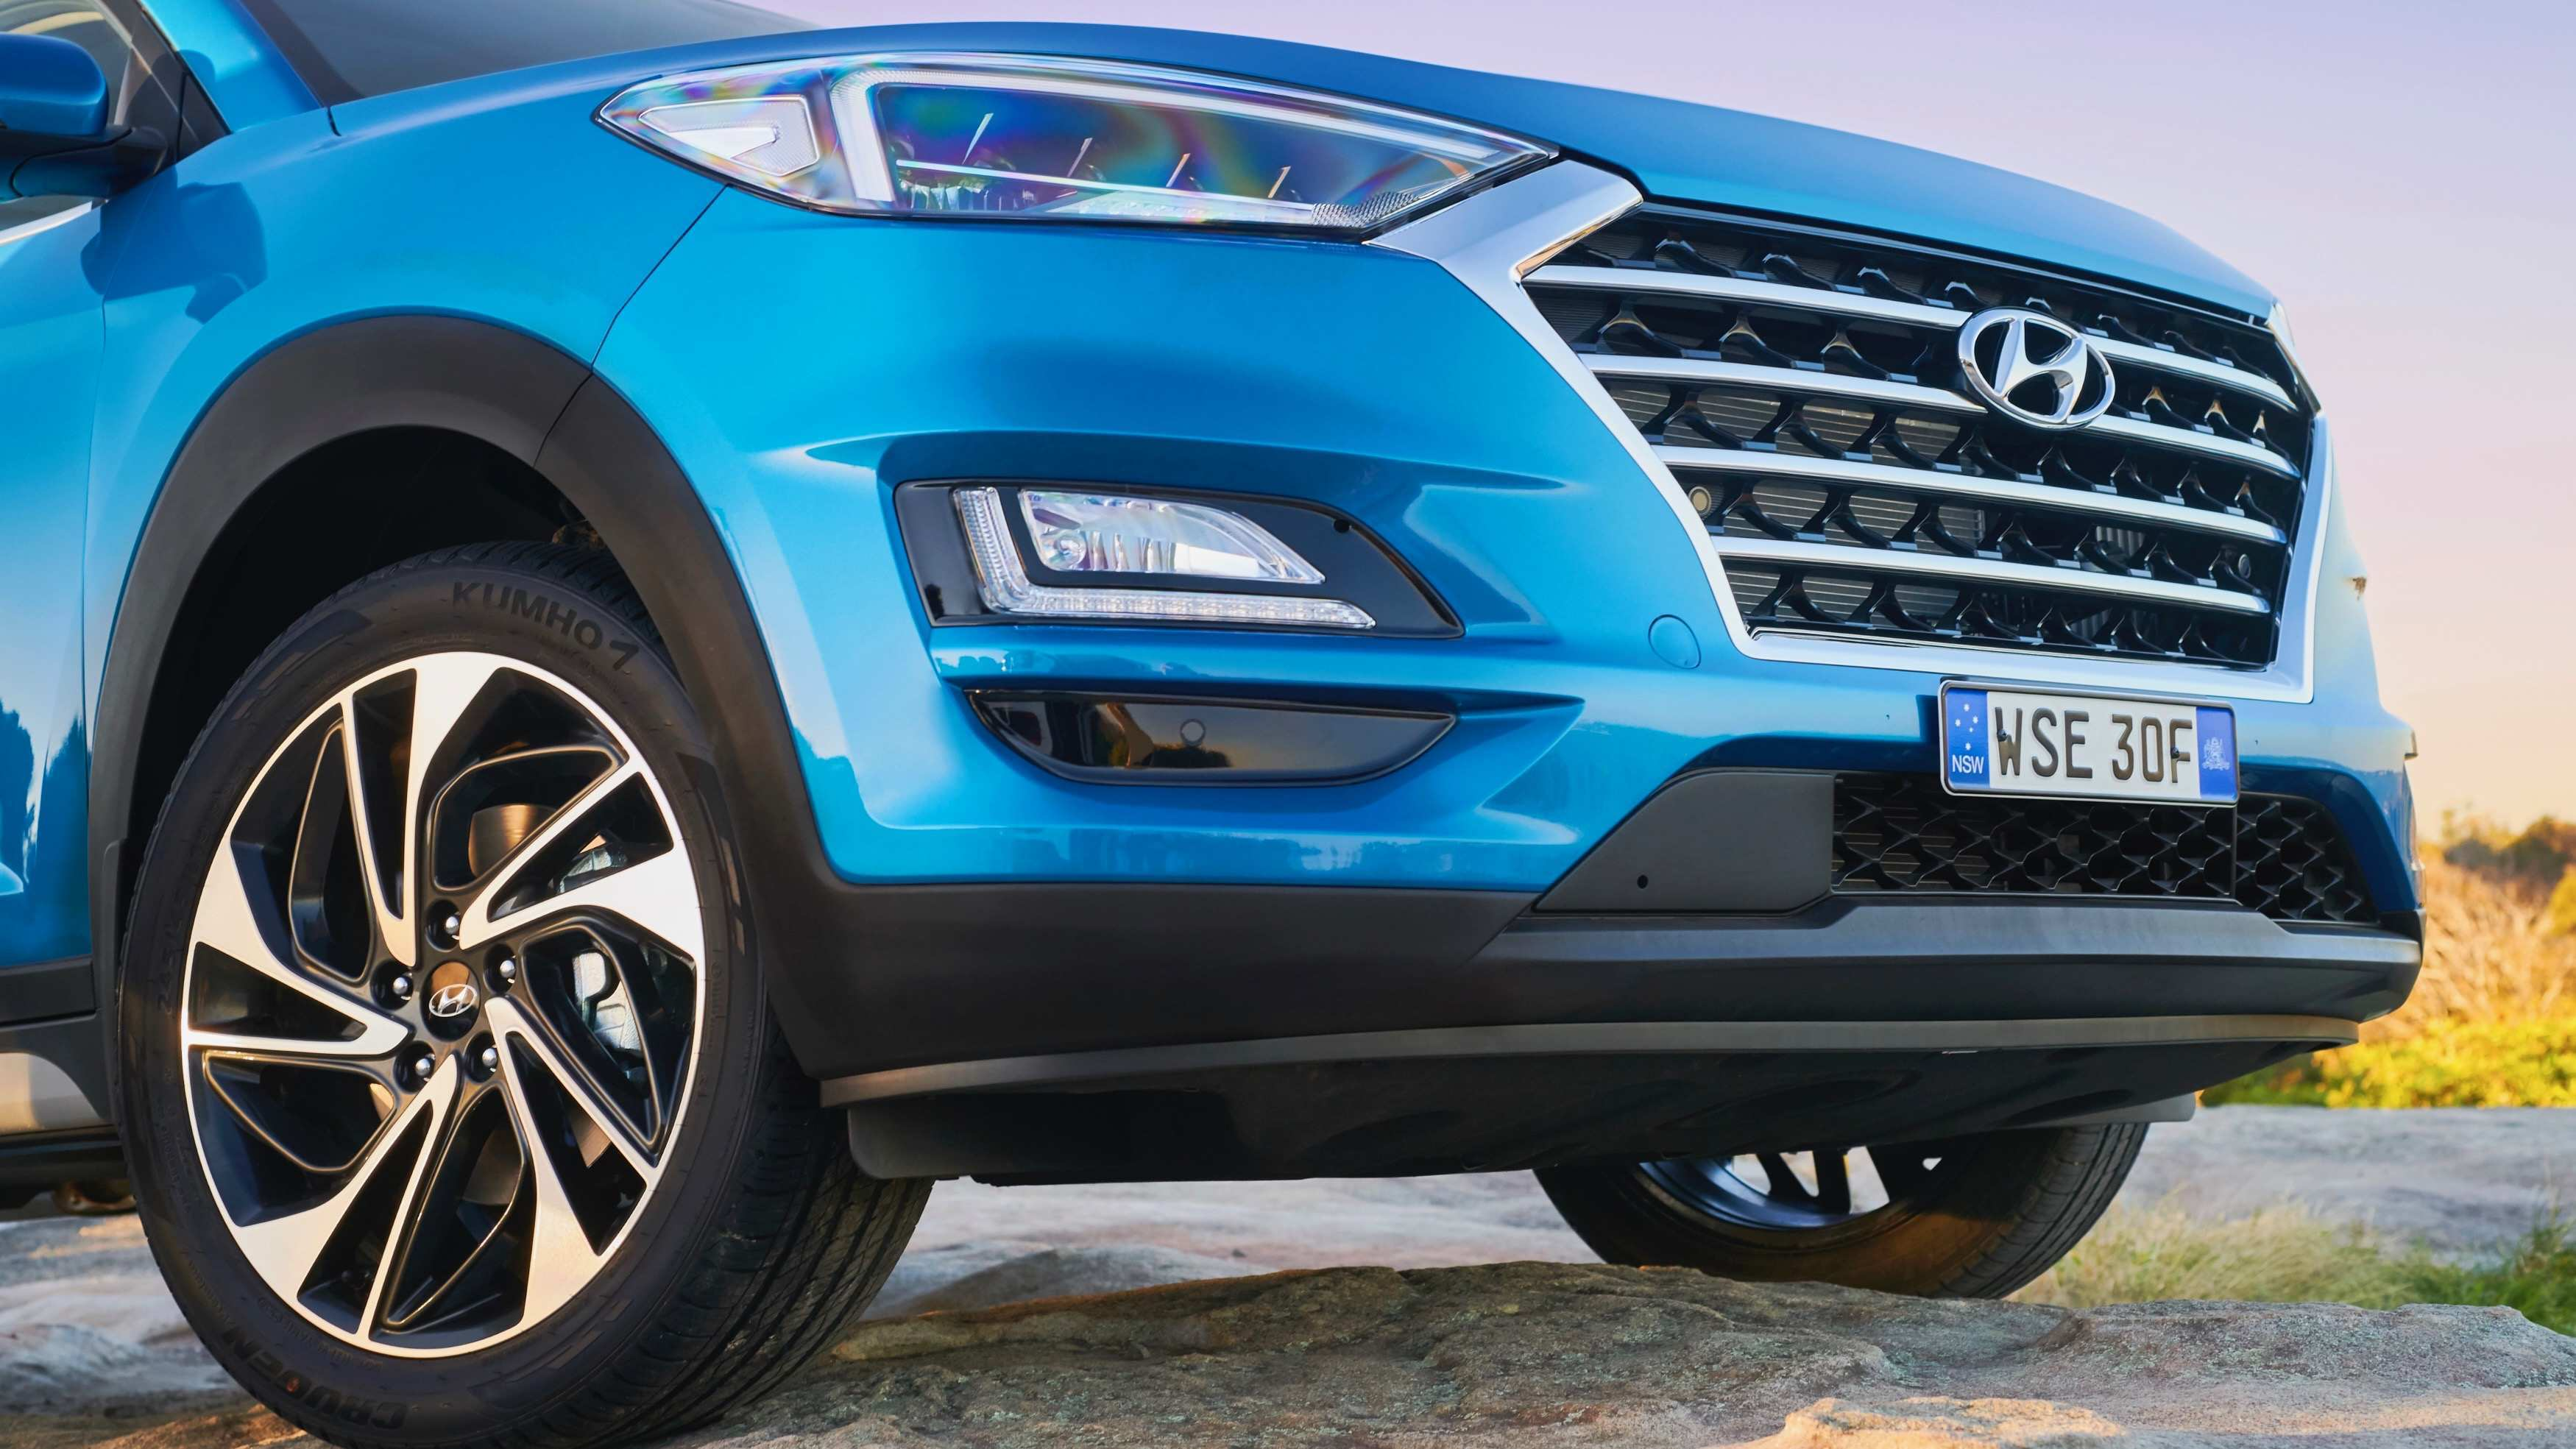 76 Concept of Hyundai Tucson N 2020 Release with Hyundai Tucson N 2020